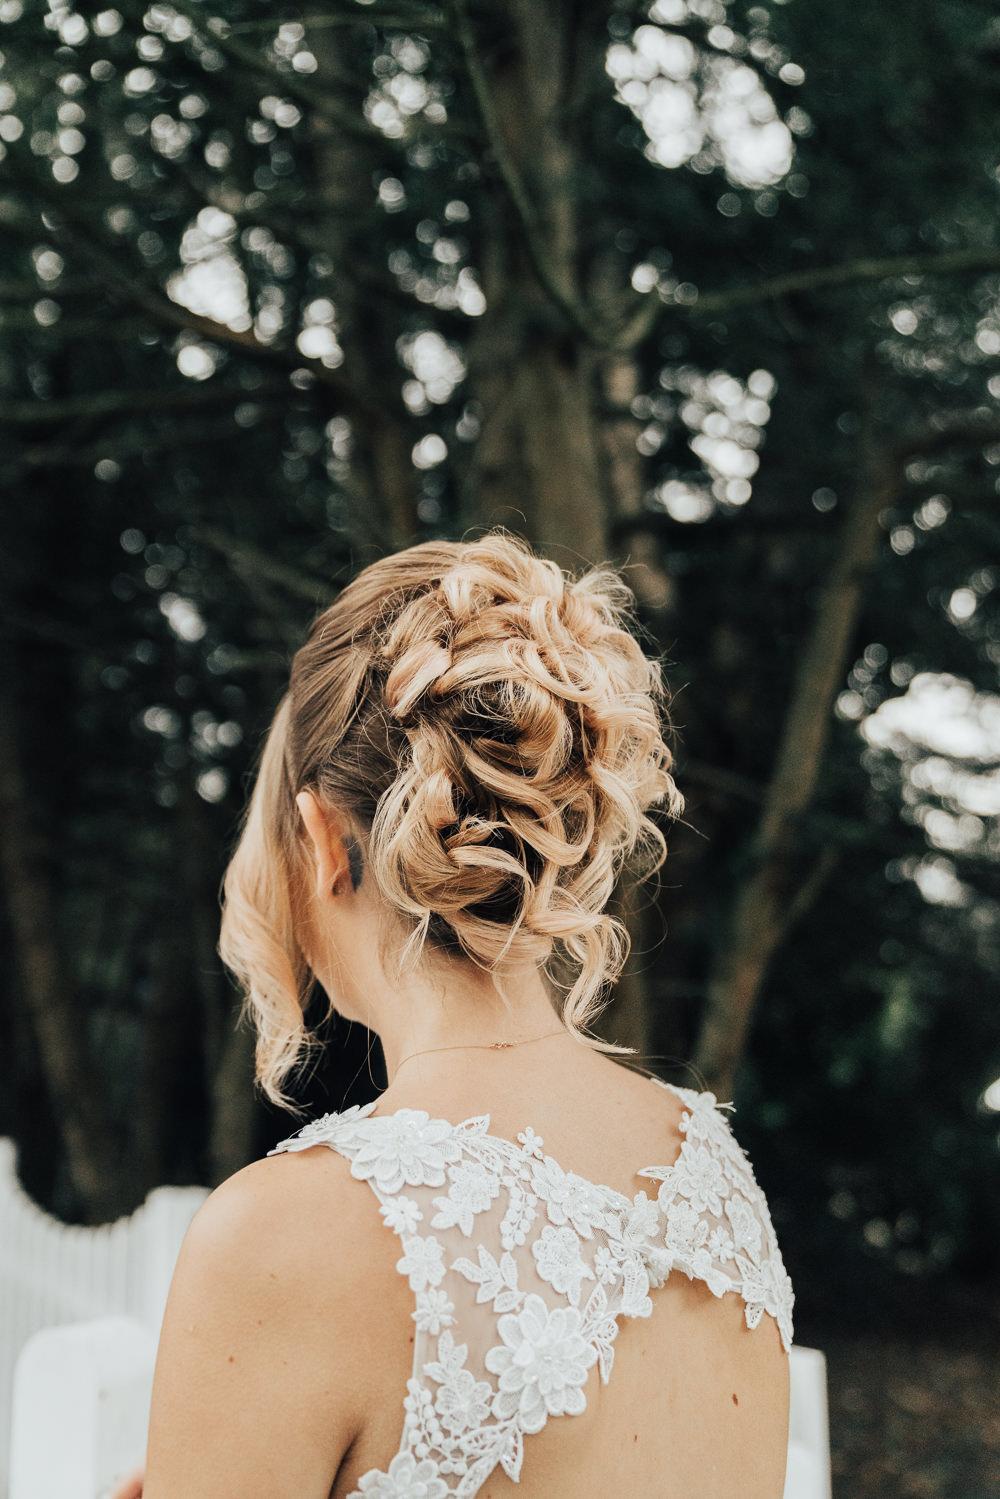 Bride Bridal Hair Style Up Do Hoop Wedding Ideas Rebecca Carpenter Photography